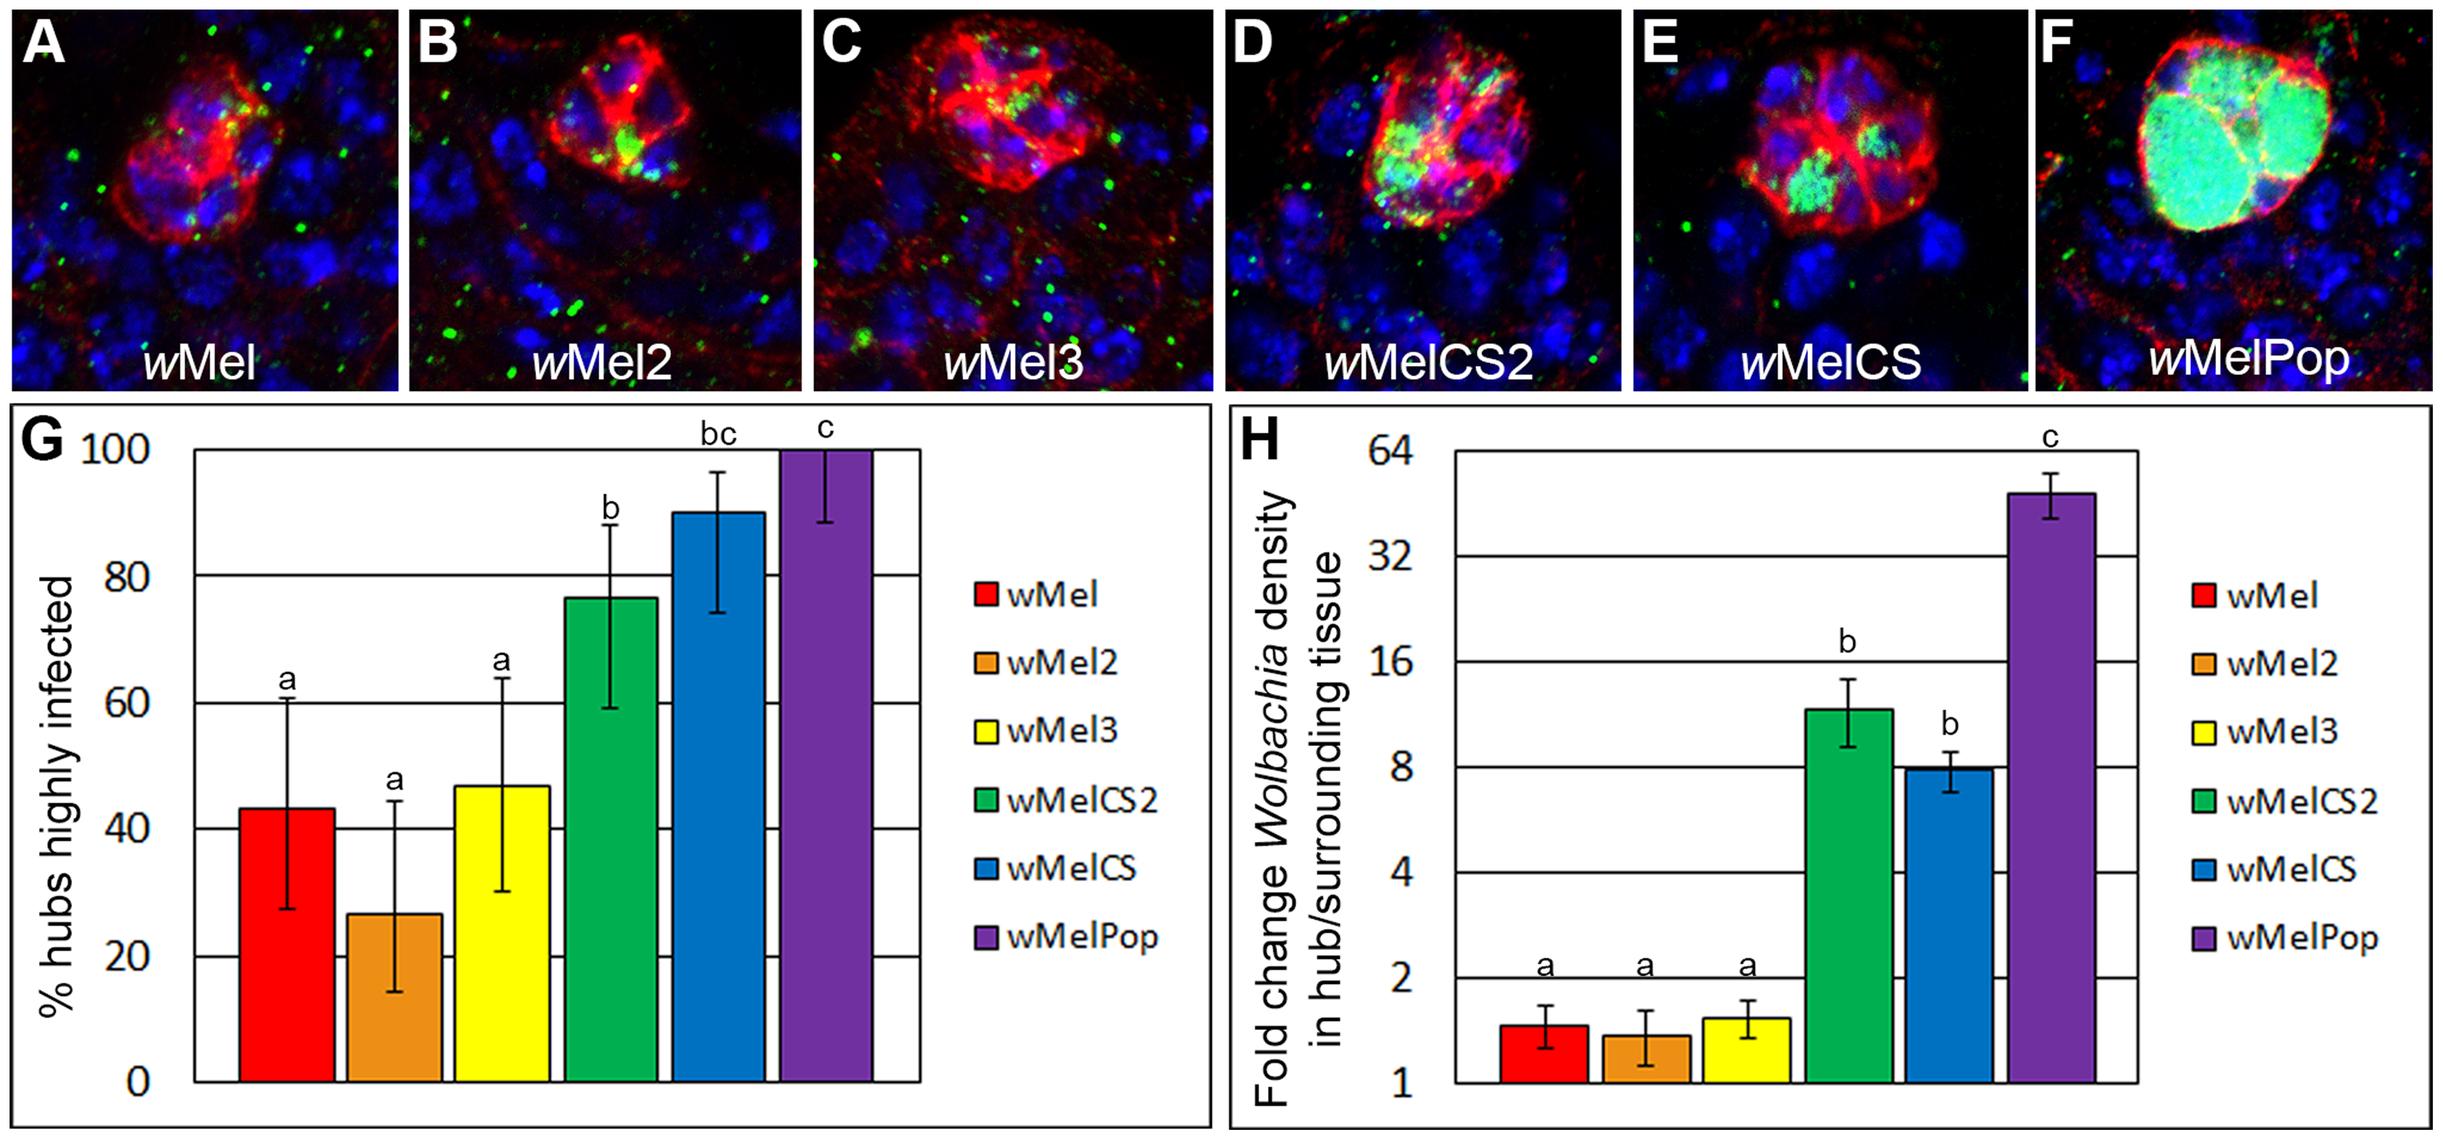 Closely related <i>Wolbachia</i> strains display rapidly divergent hub tropism phenotypes in <i>Drosophila melanogaster</i>.